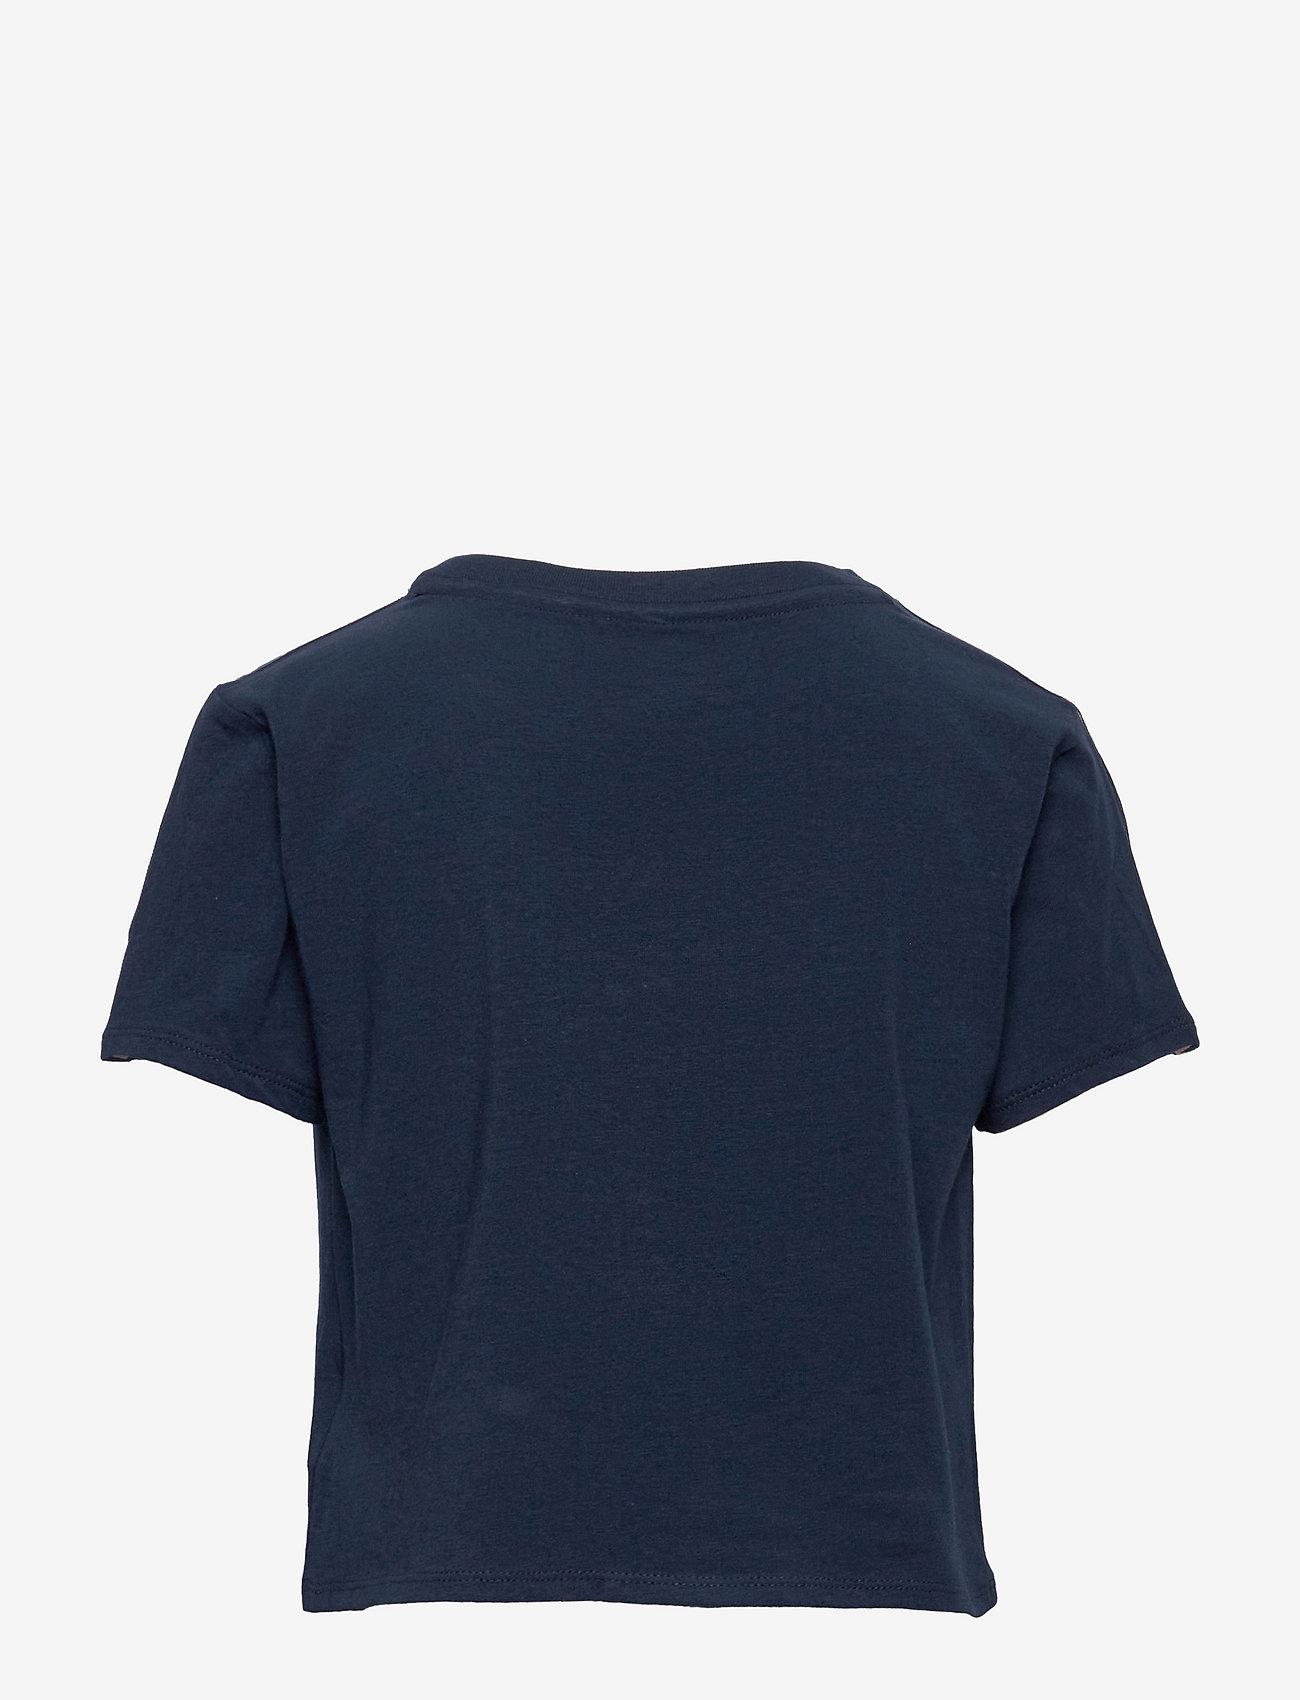 Calvin Klein - TOP - korte mouwen - navy iris - 1